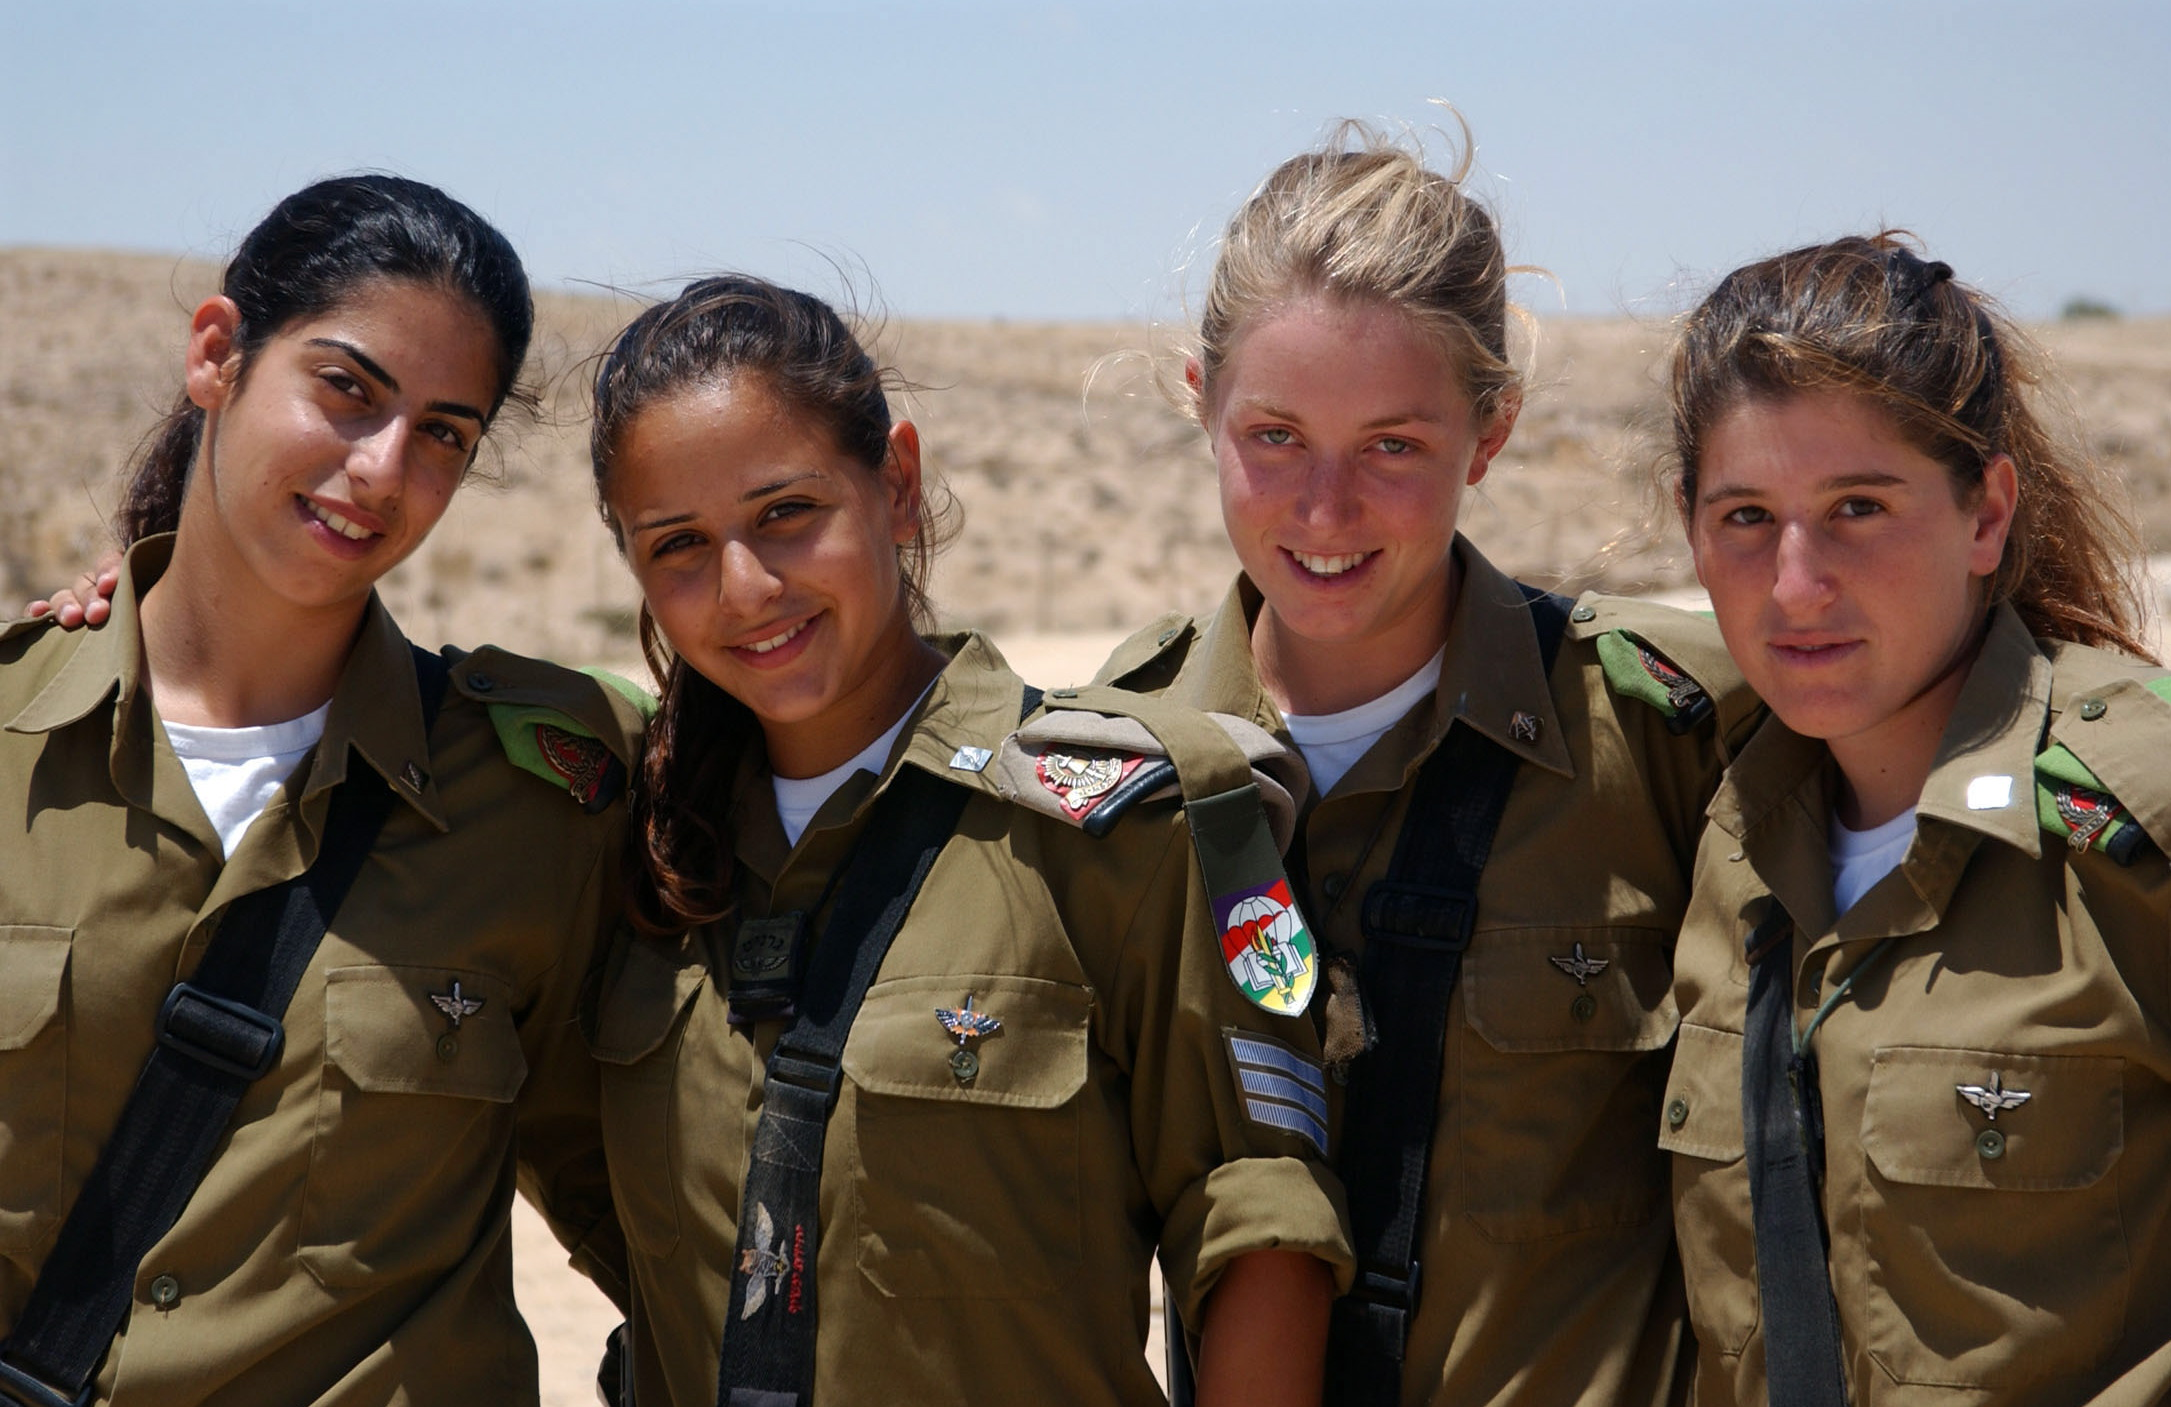 IDF female infantry recruits: en.academic.ru/dic.nsf/enwiki/24611